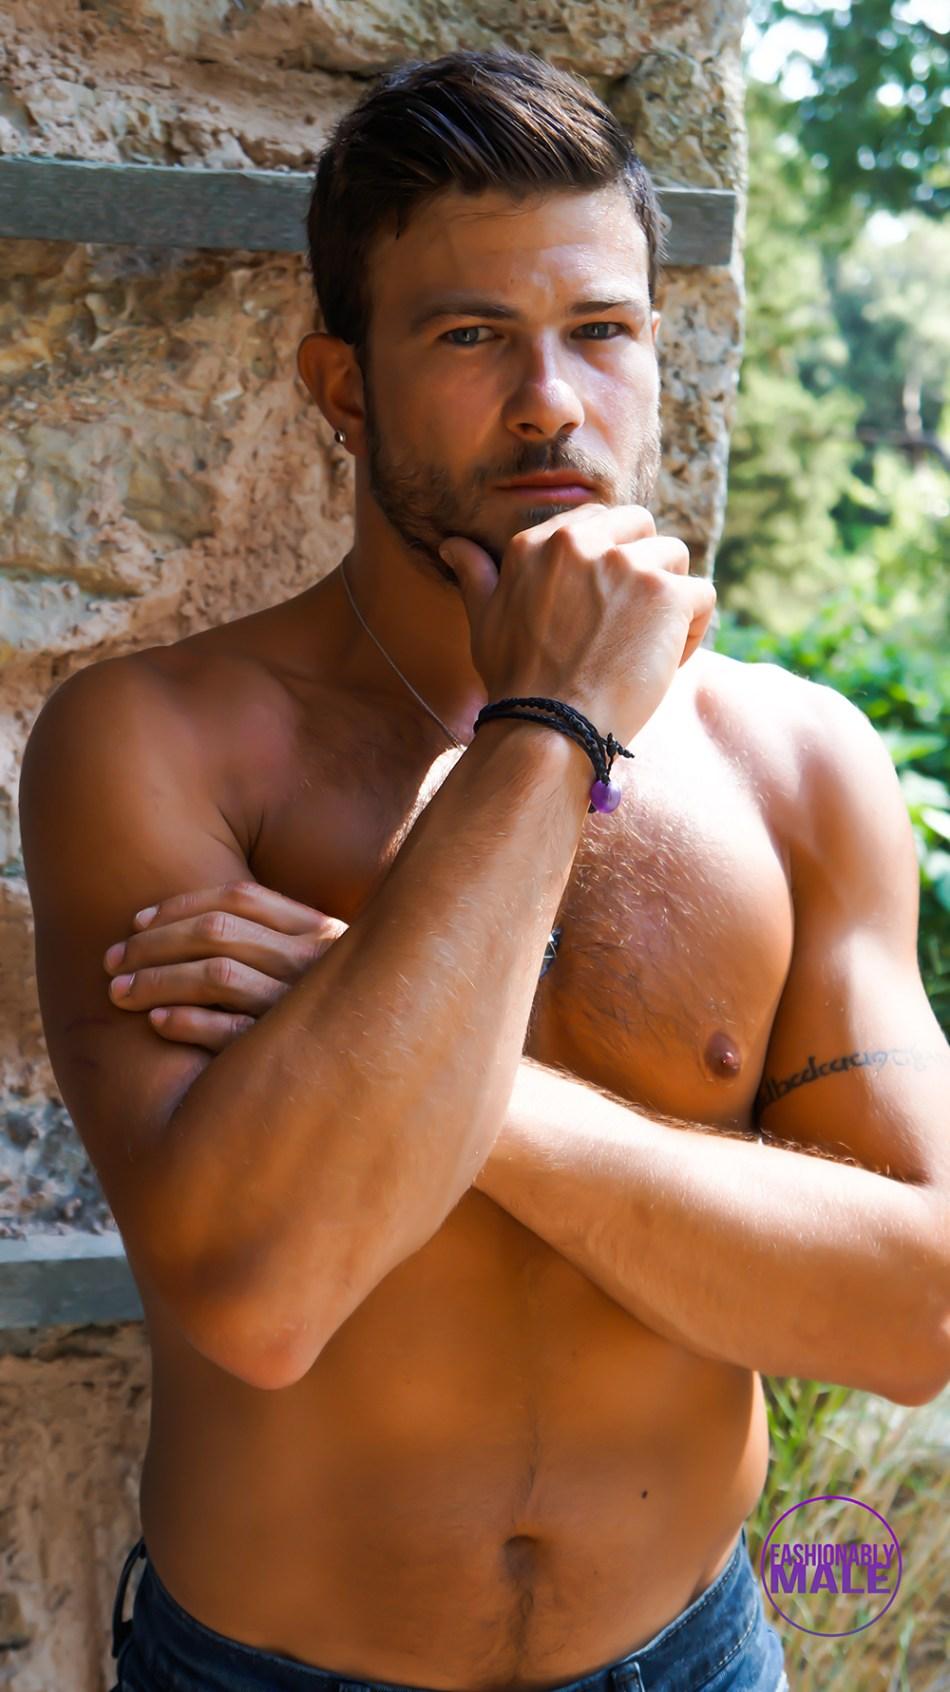 He's Your Man! Meet George Tsak by Raftopoulos Argiris Part II